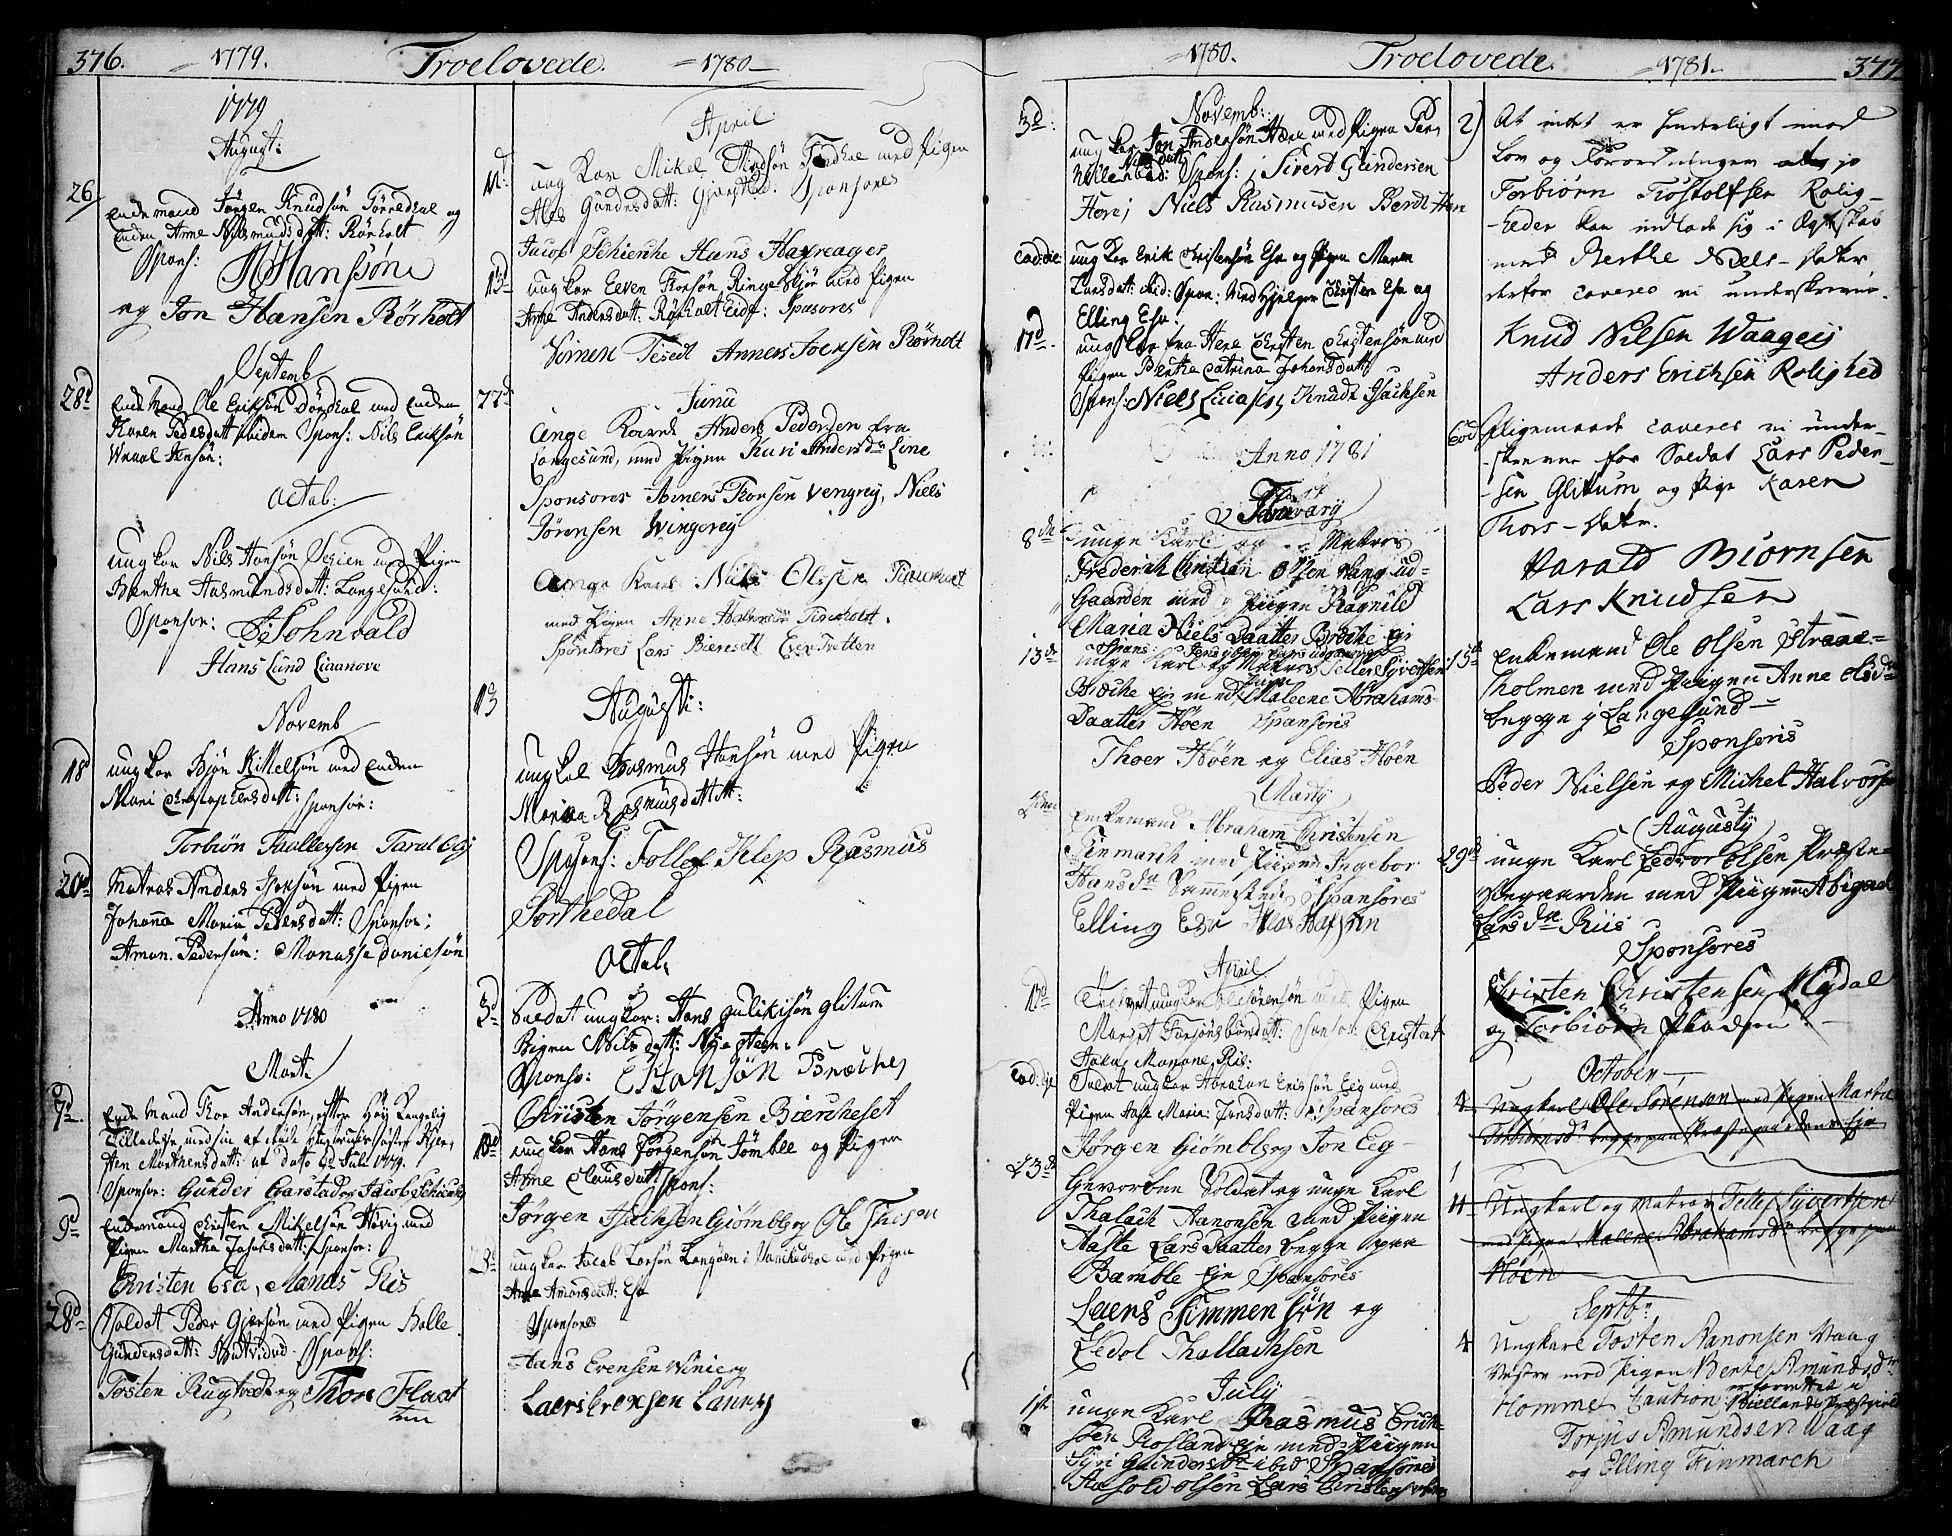 SAKO, Bamble kirkebøker, F/Fa/L0002: Ministerialbok nr. I 2, 1775-1814, s. 376-377